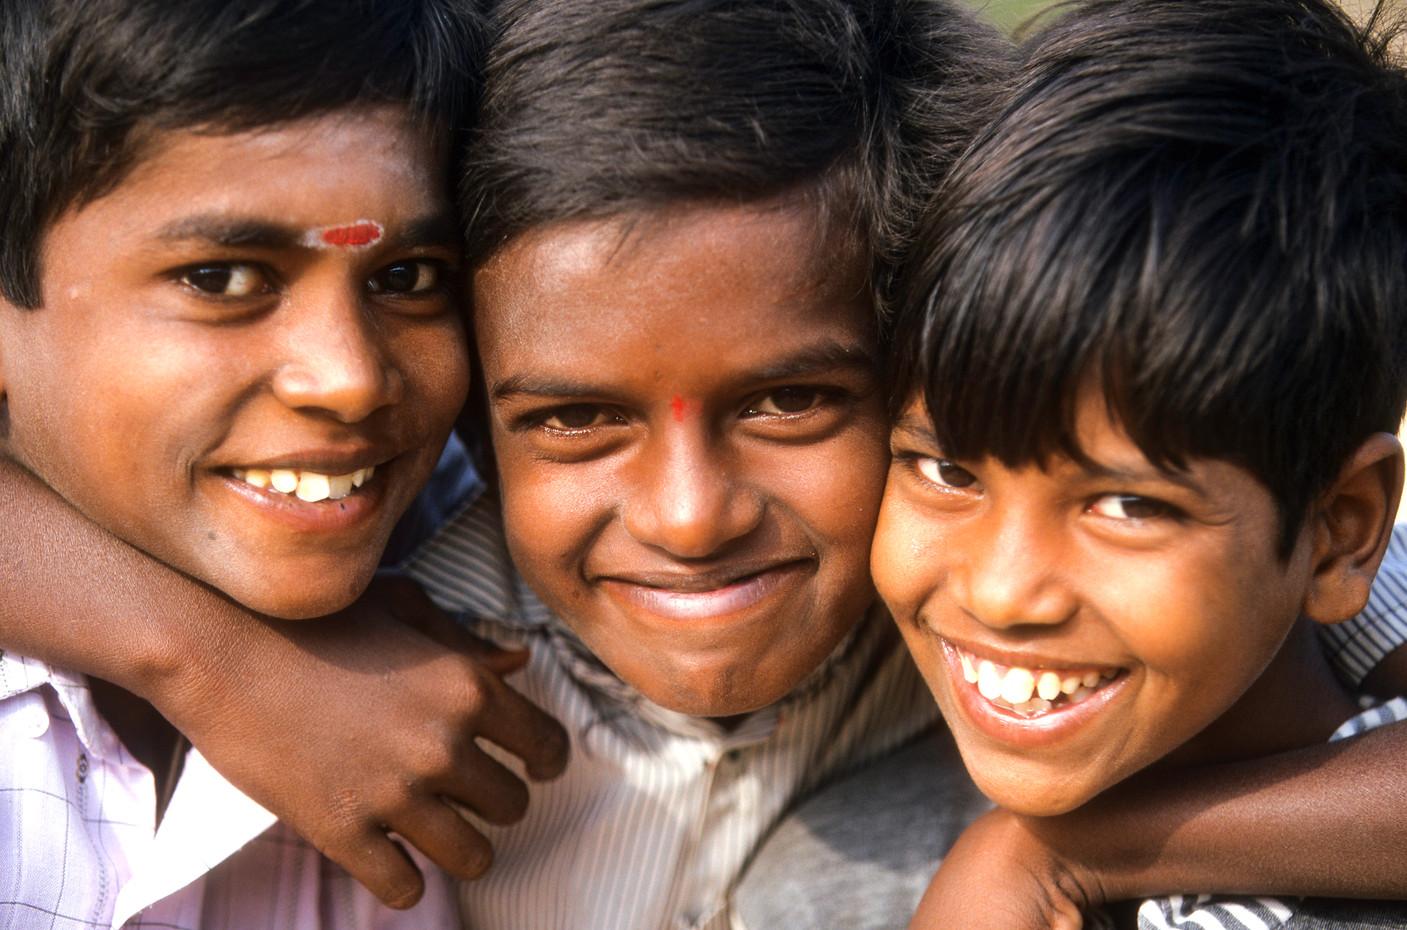 School boys near Bhopal, In